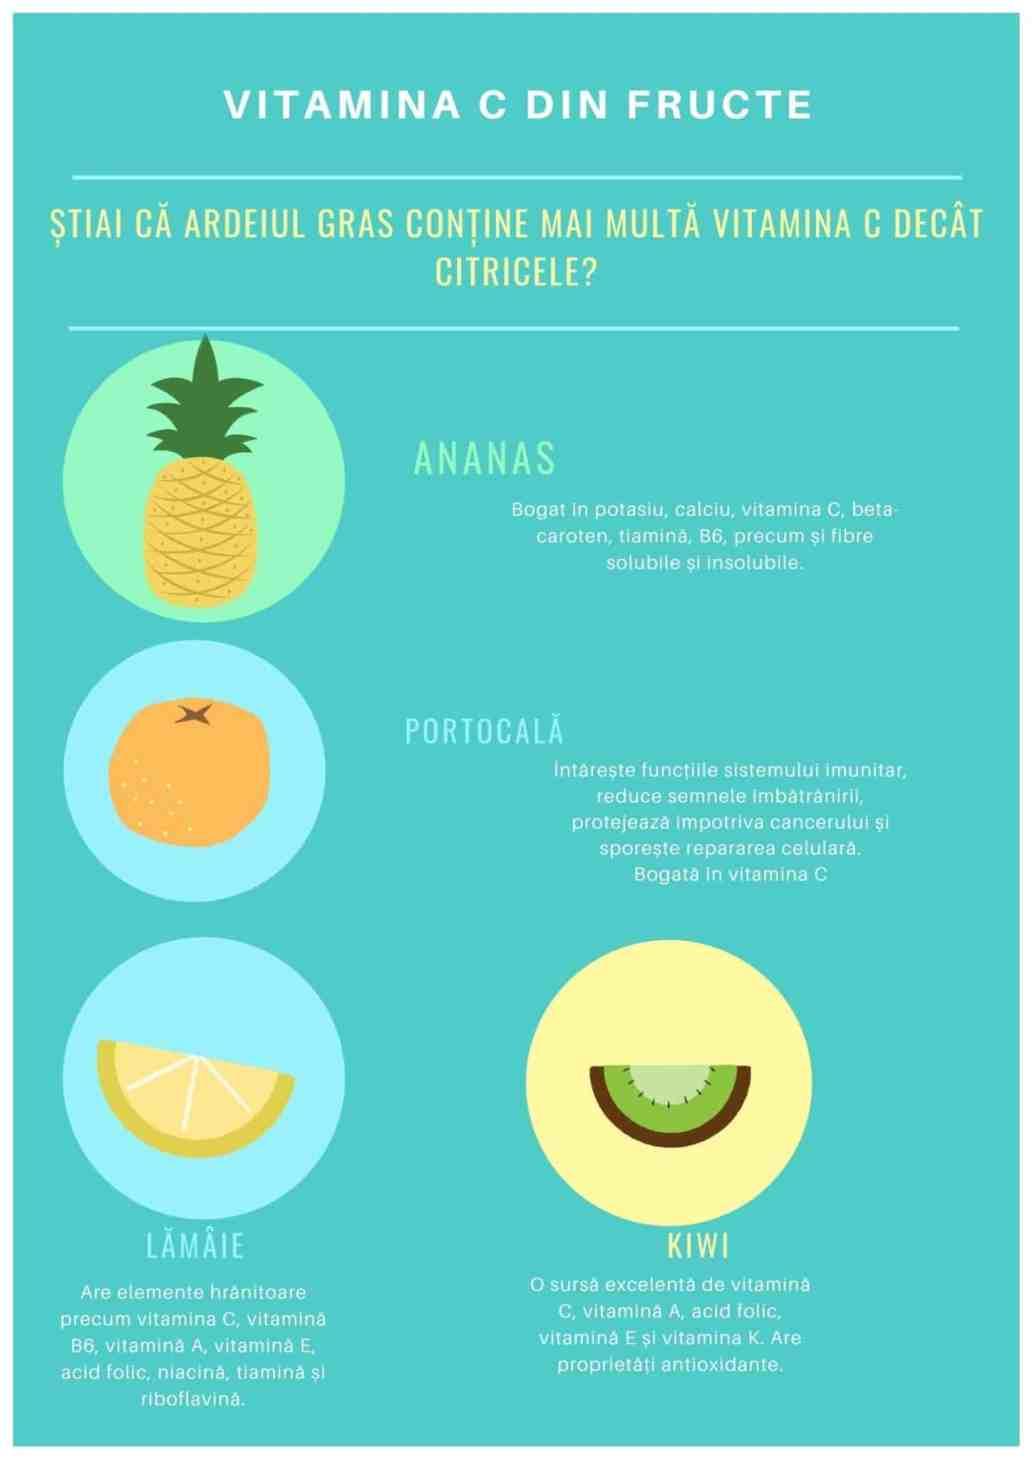 Vitamina C din fructe